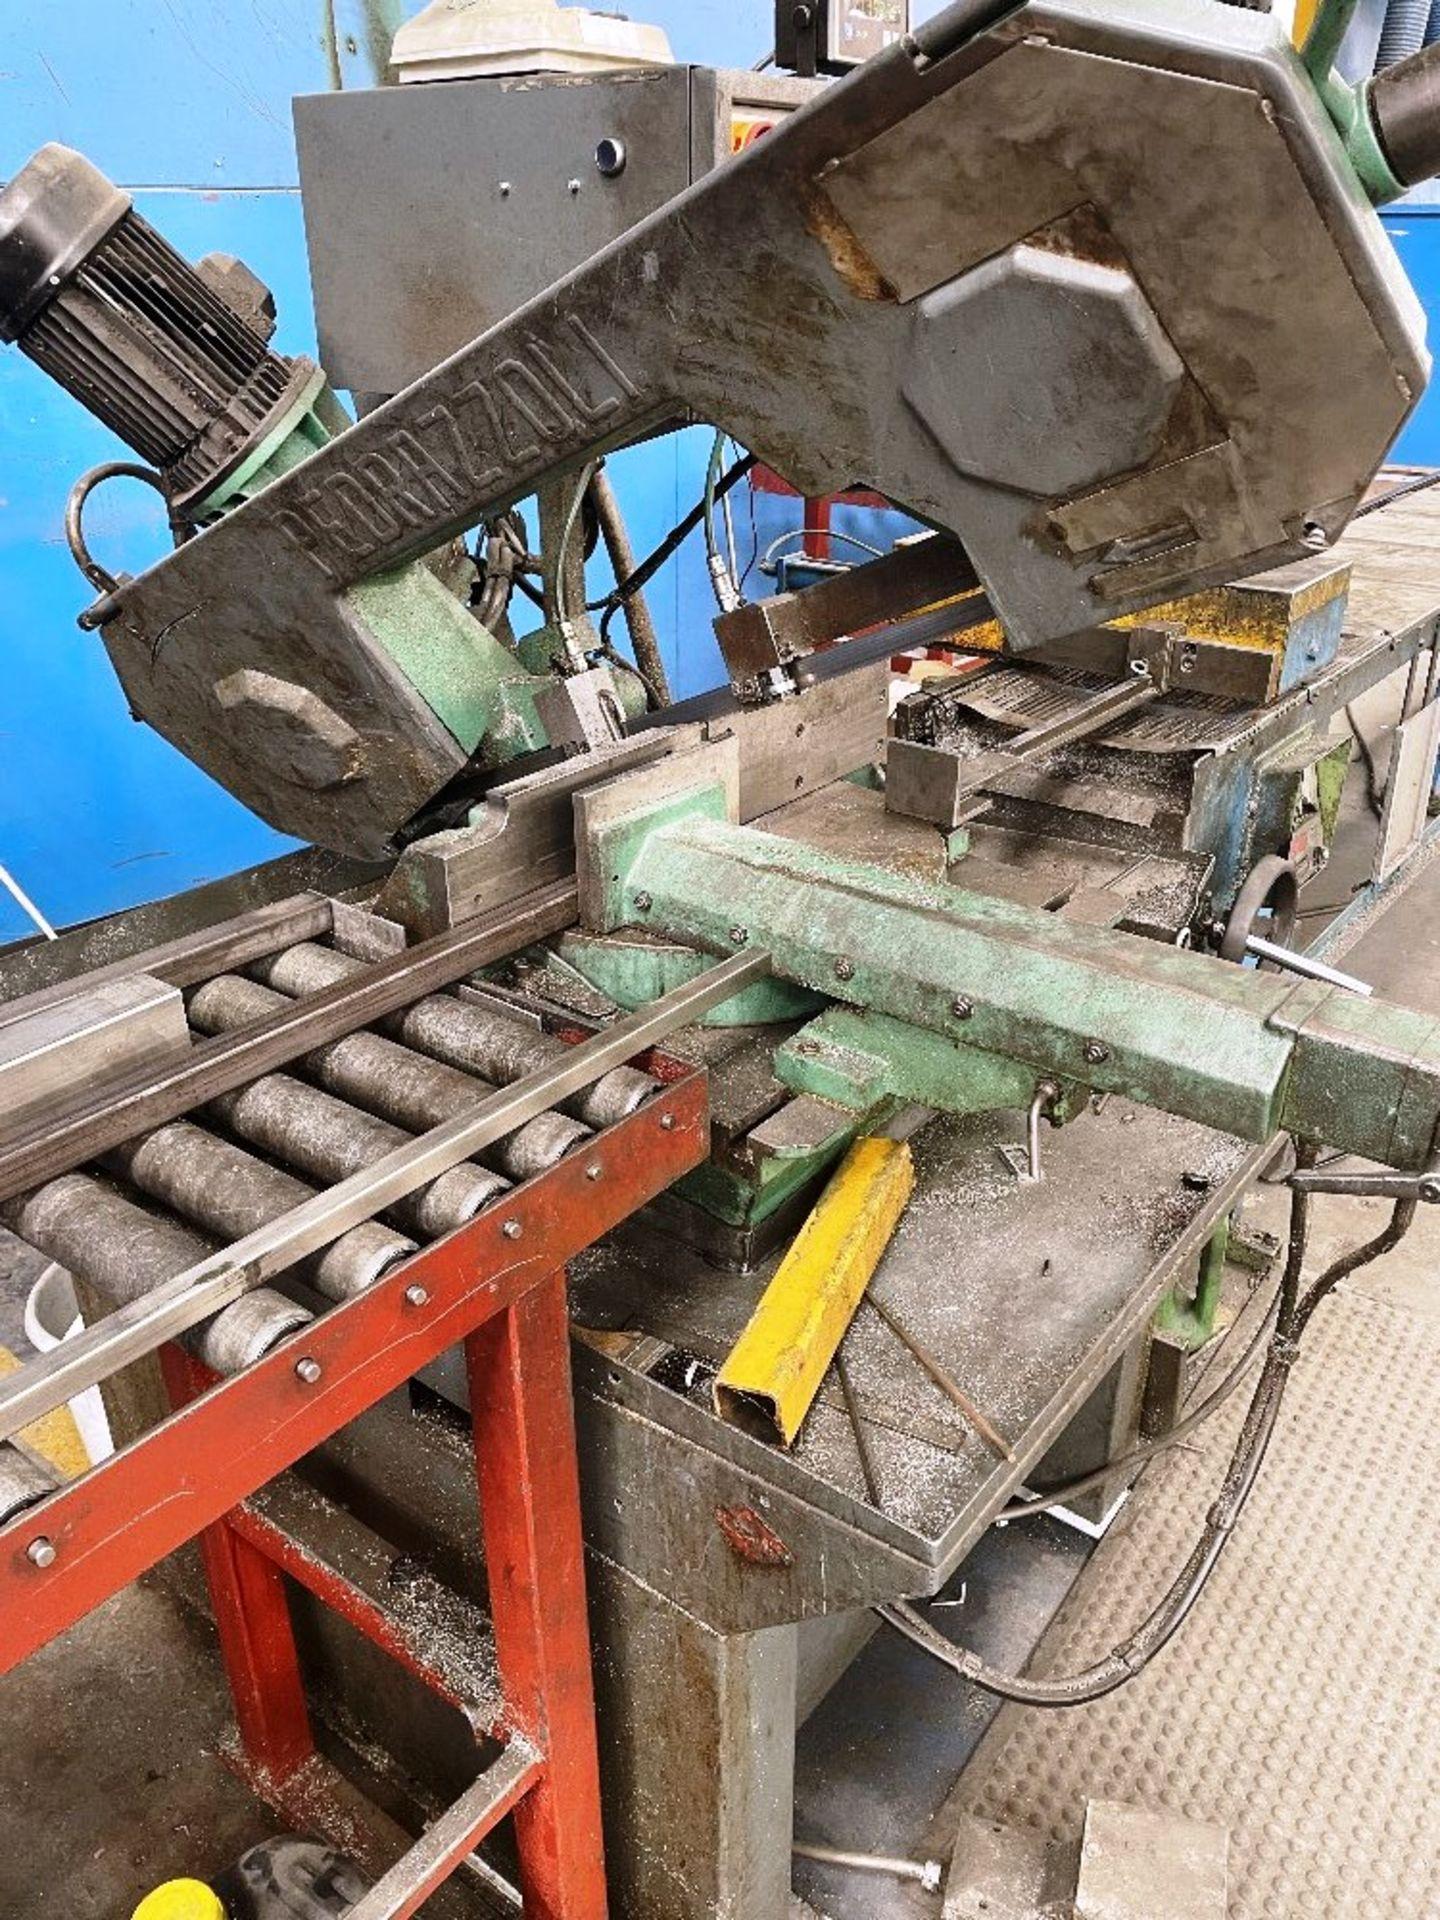 Pedrazzoli Brown SC 300 Horizontal Bandsaw w/ 4m Powered Conveyor - Image 5 of 12